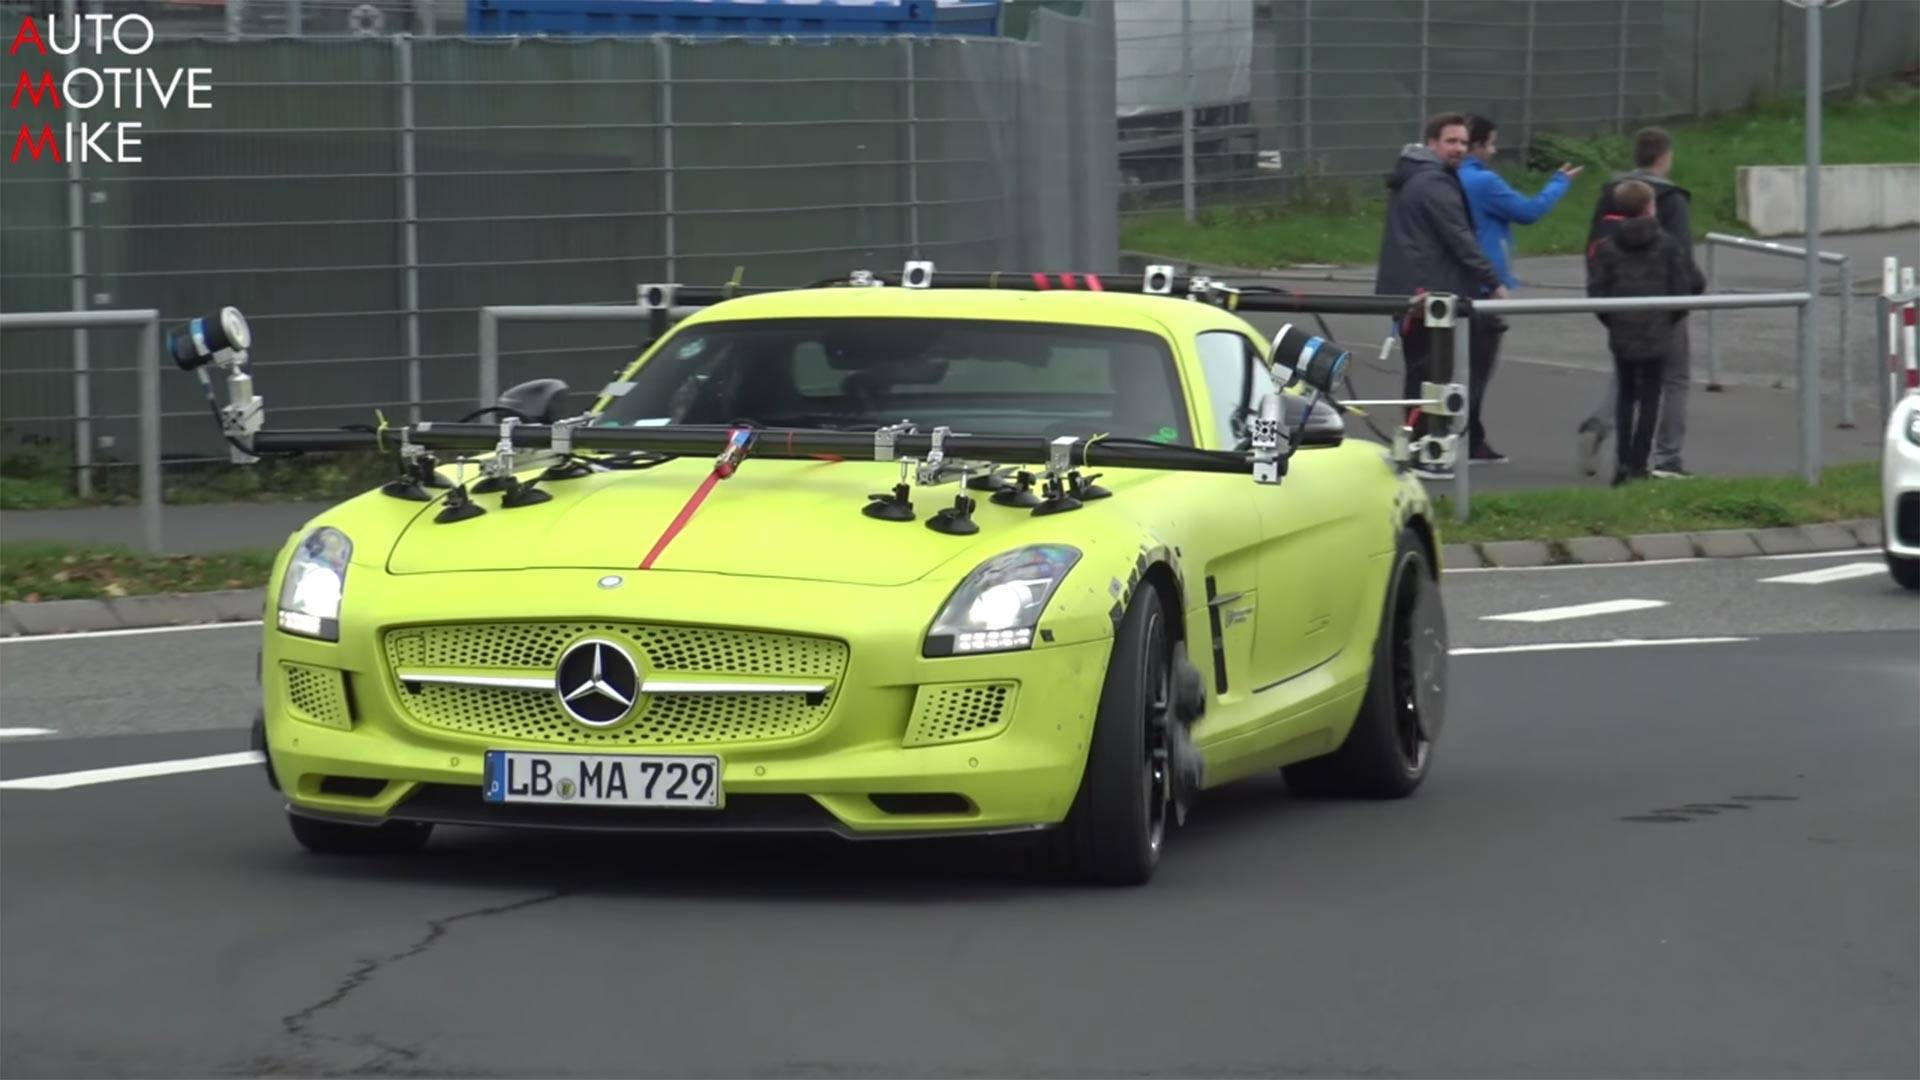 2014 Mercedesbenz Sls Amg Electric Drive Photo